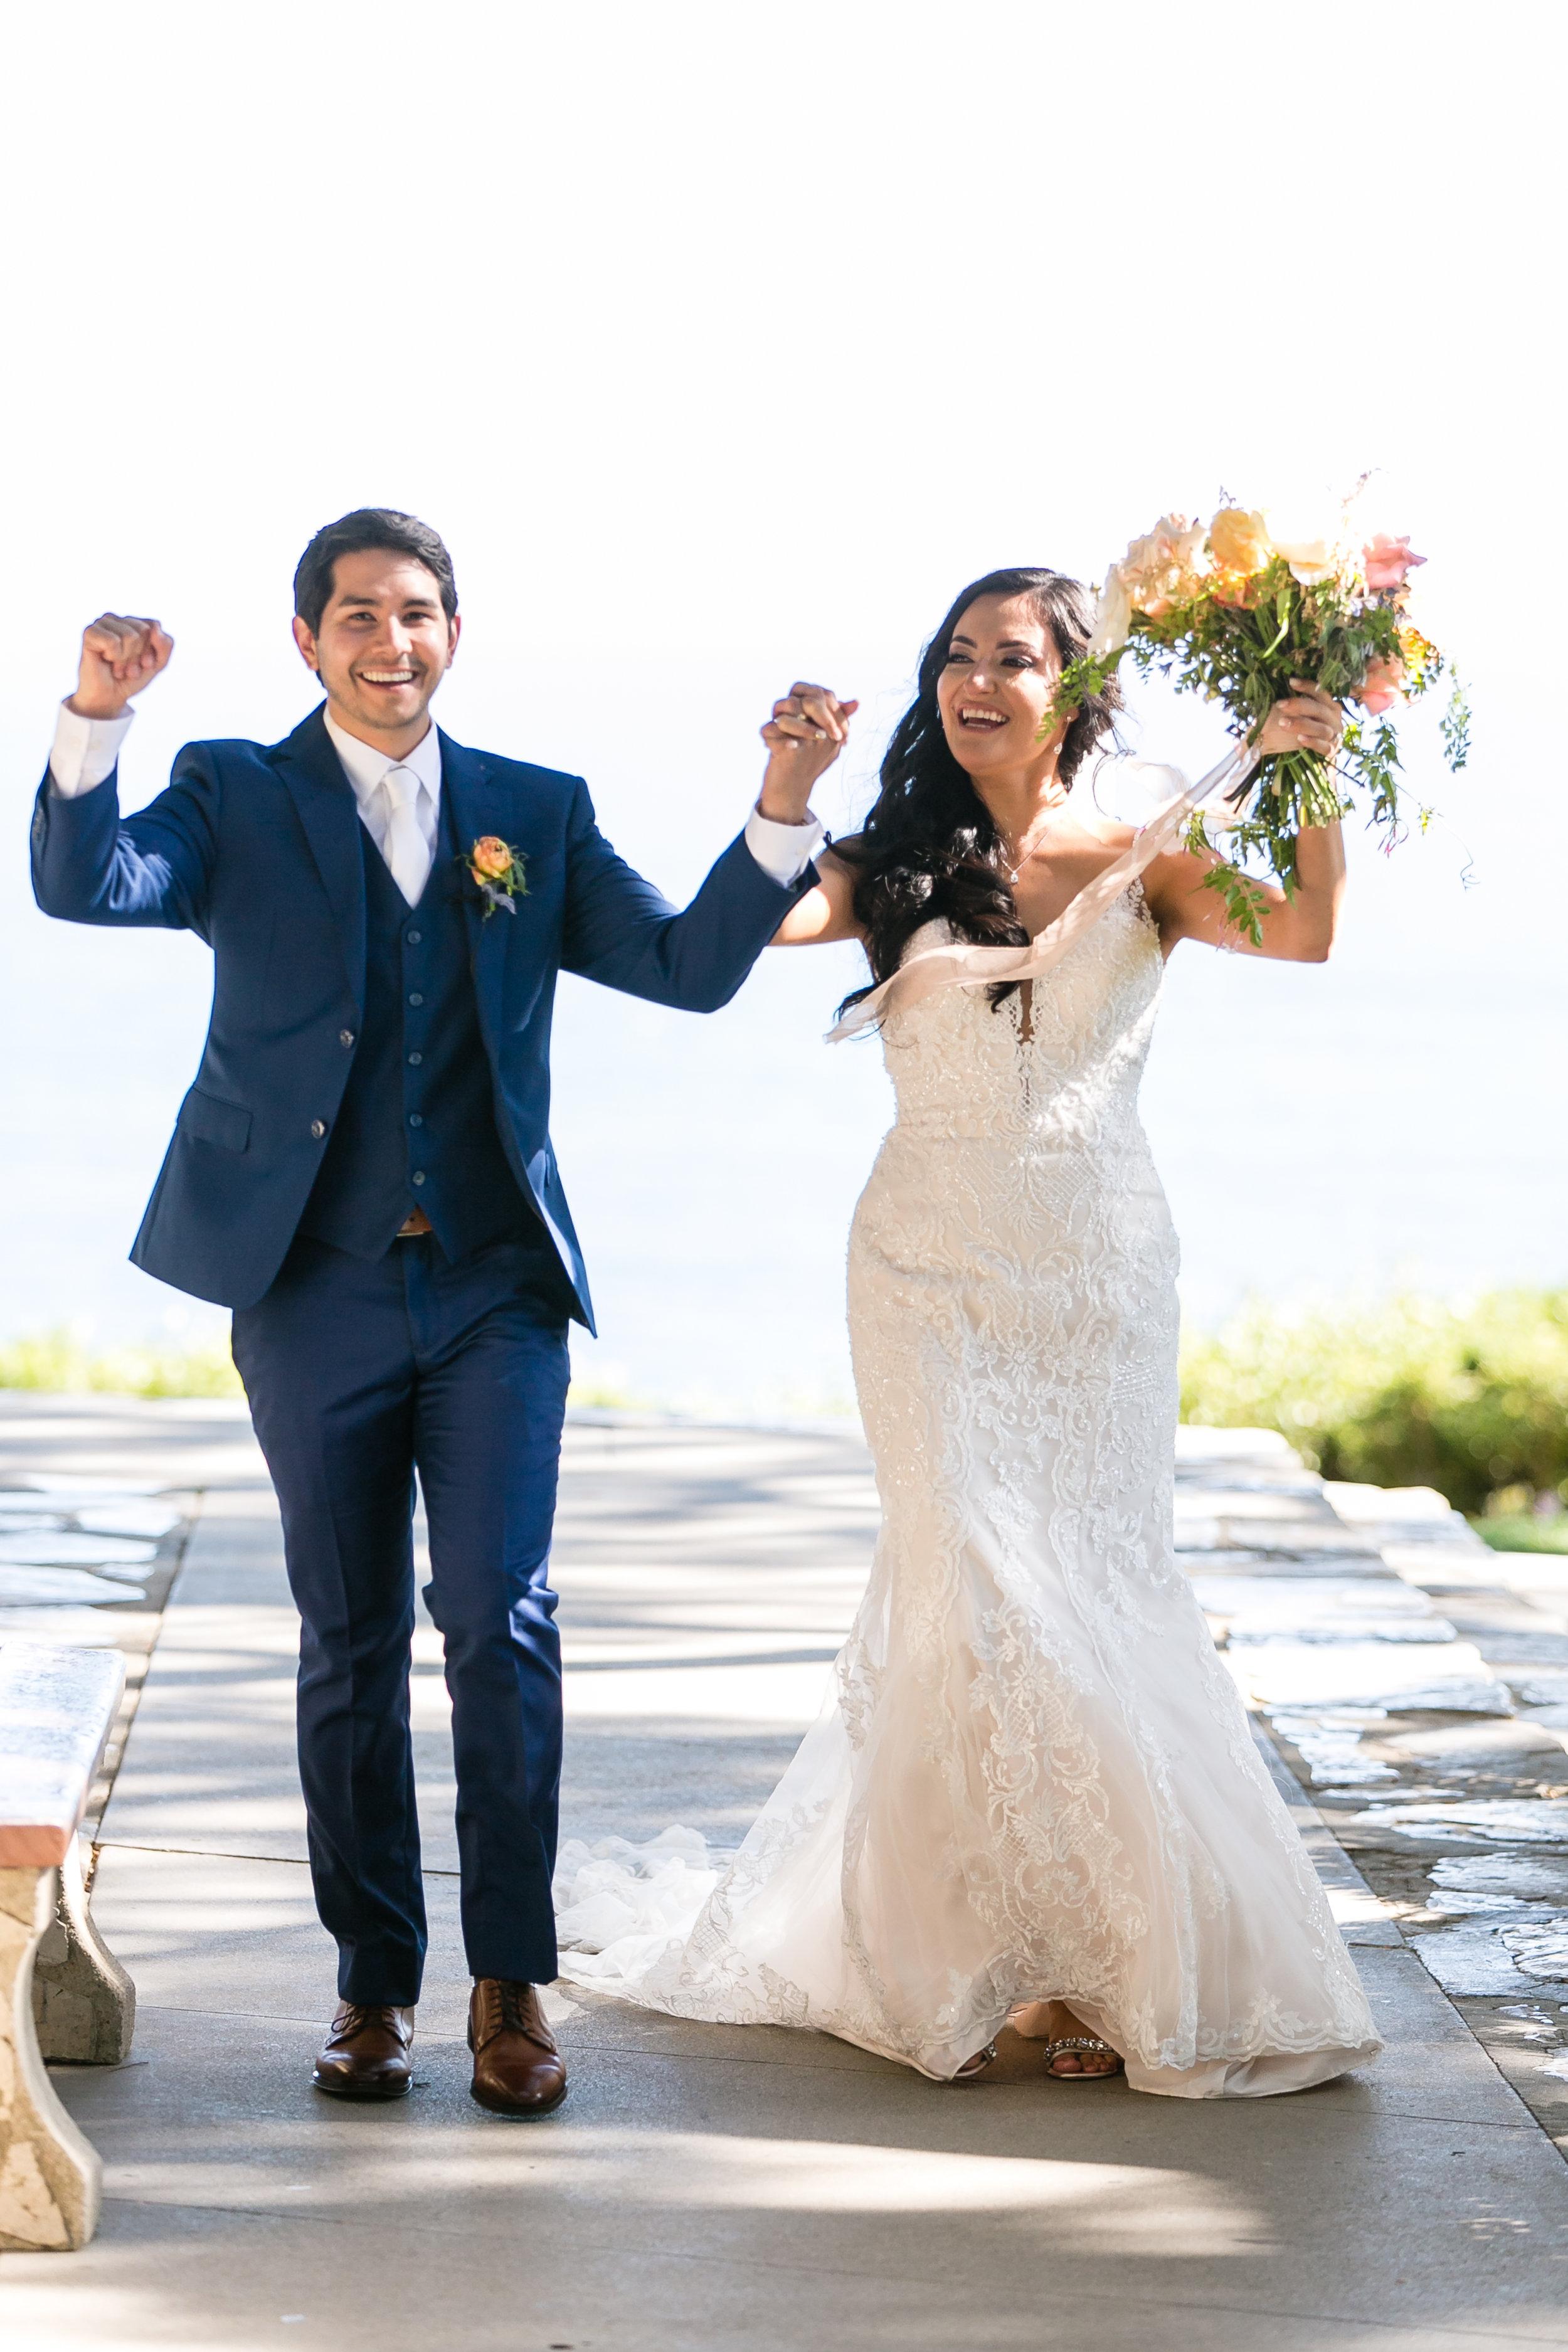 2019_05_24_Wedding_Barajas_0624.jpg